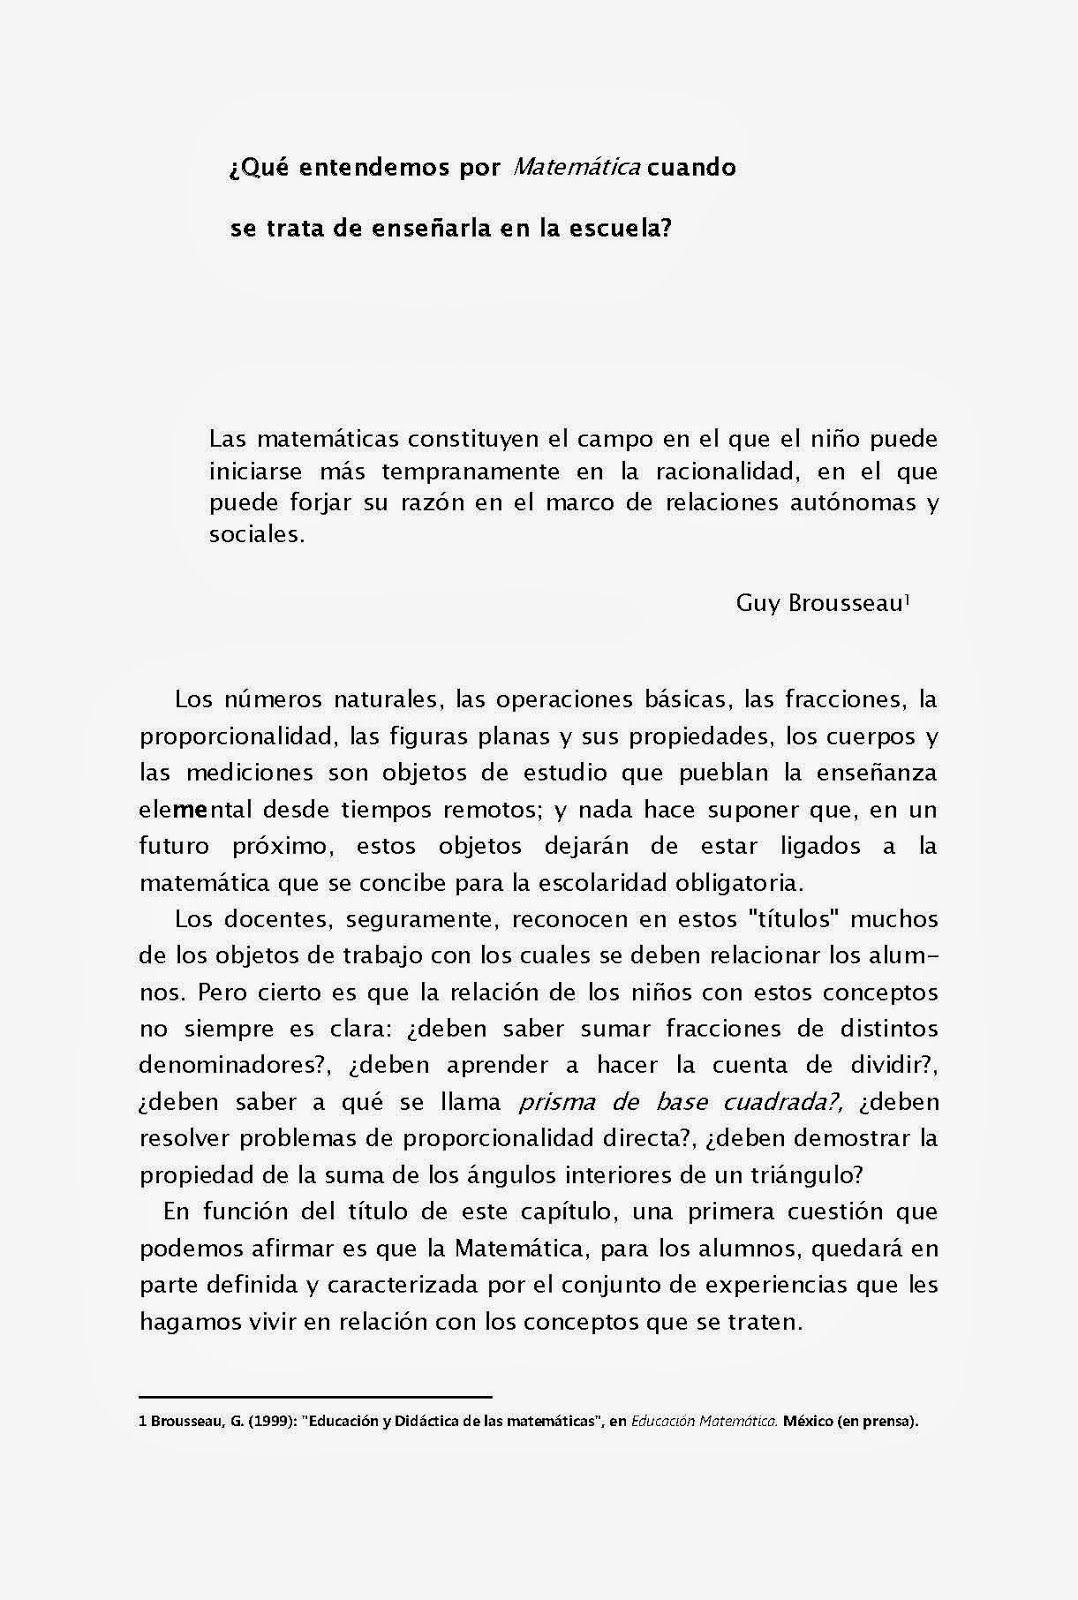 Edaic Varela Equipo Distrital De Alfabetizacion Inicial Y Continua Mate